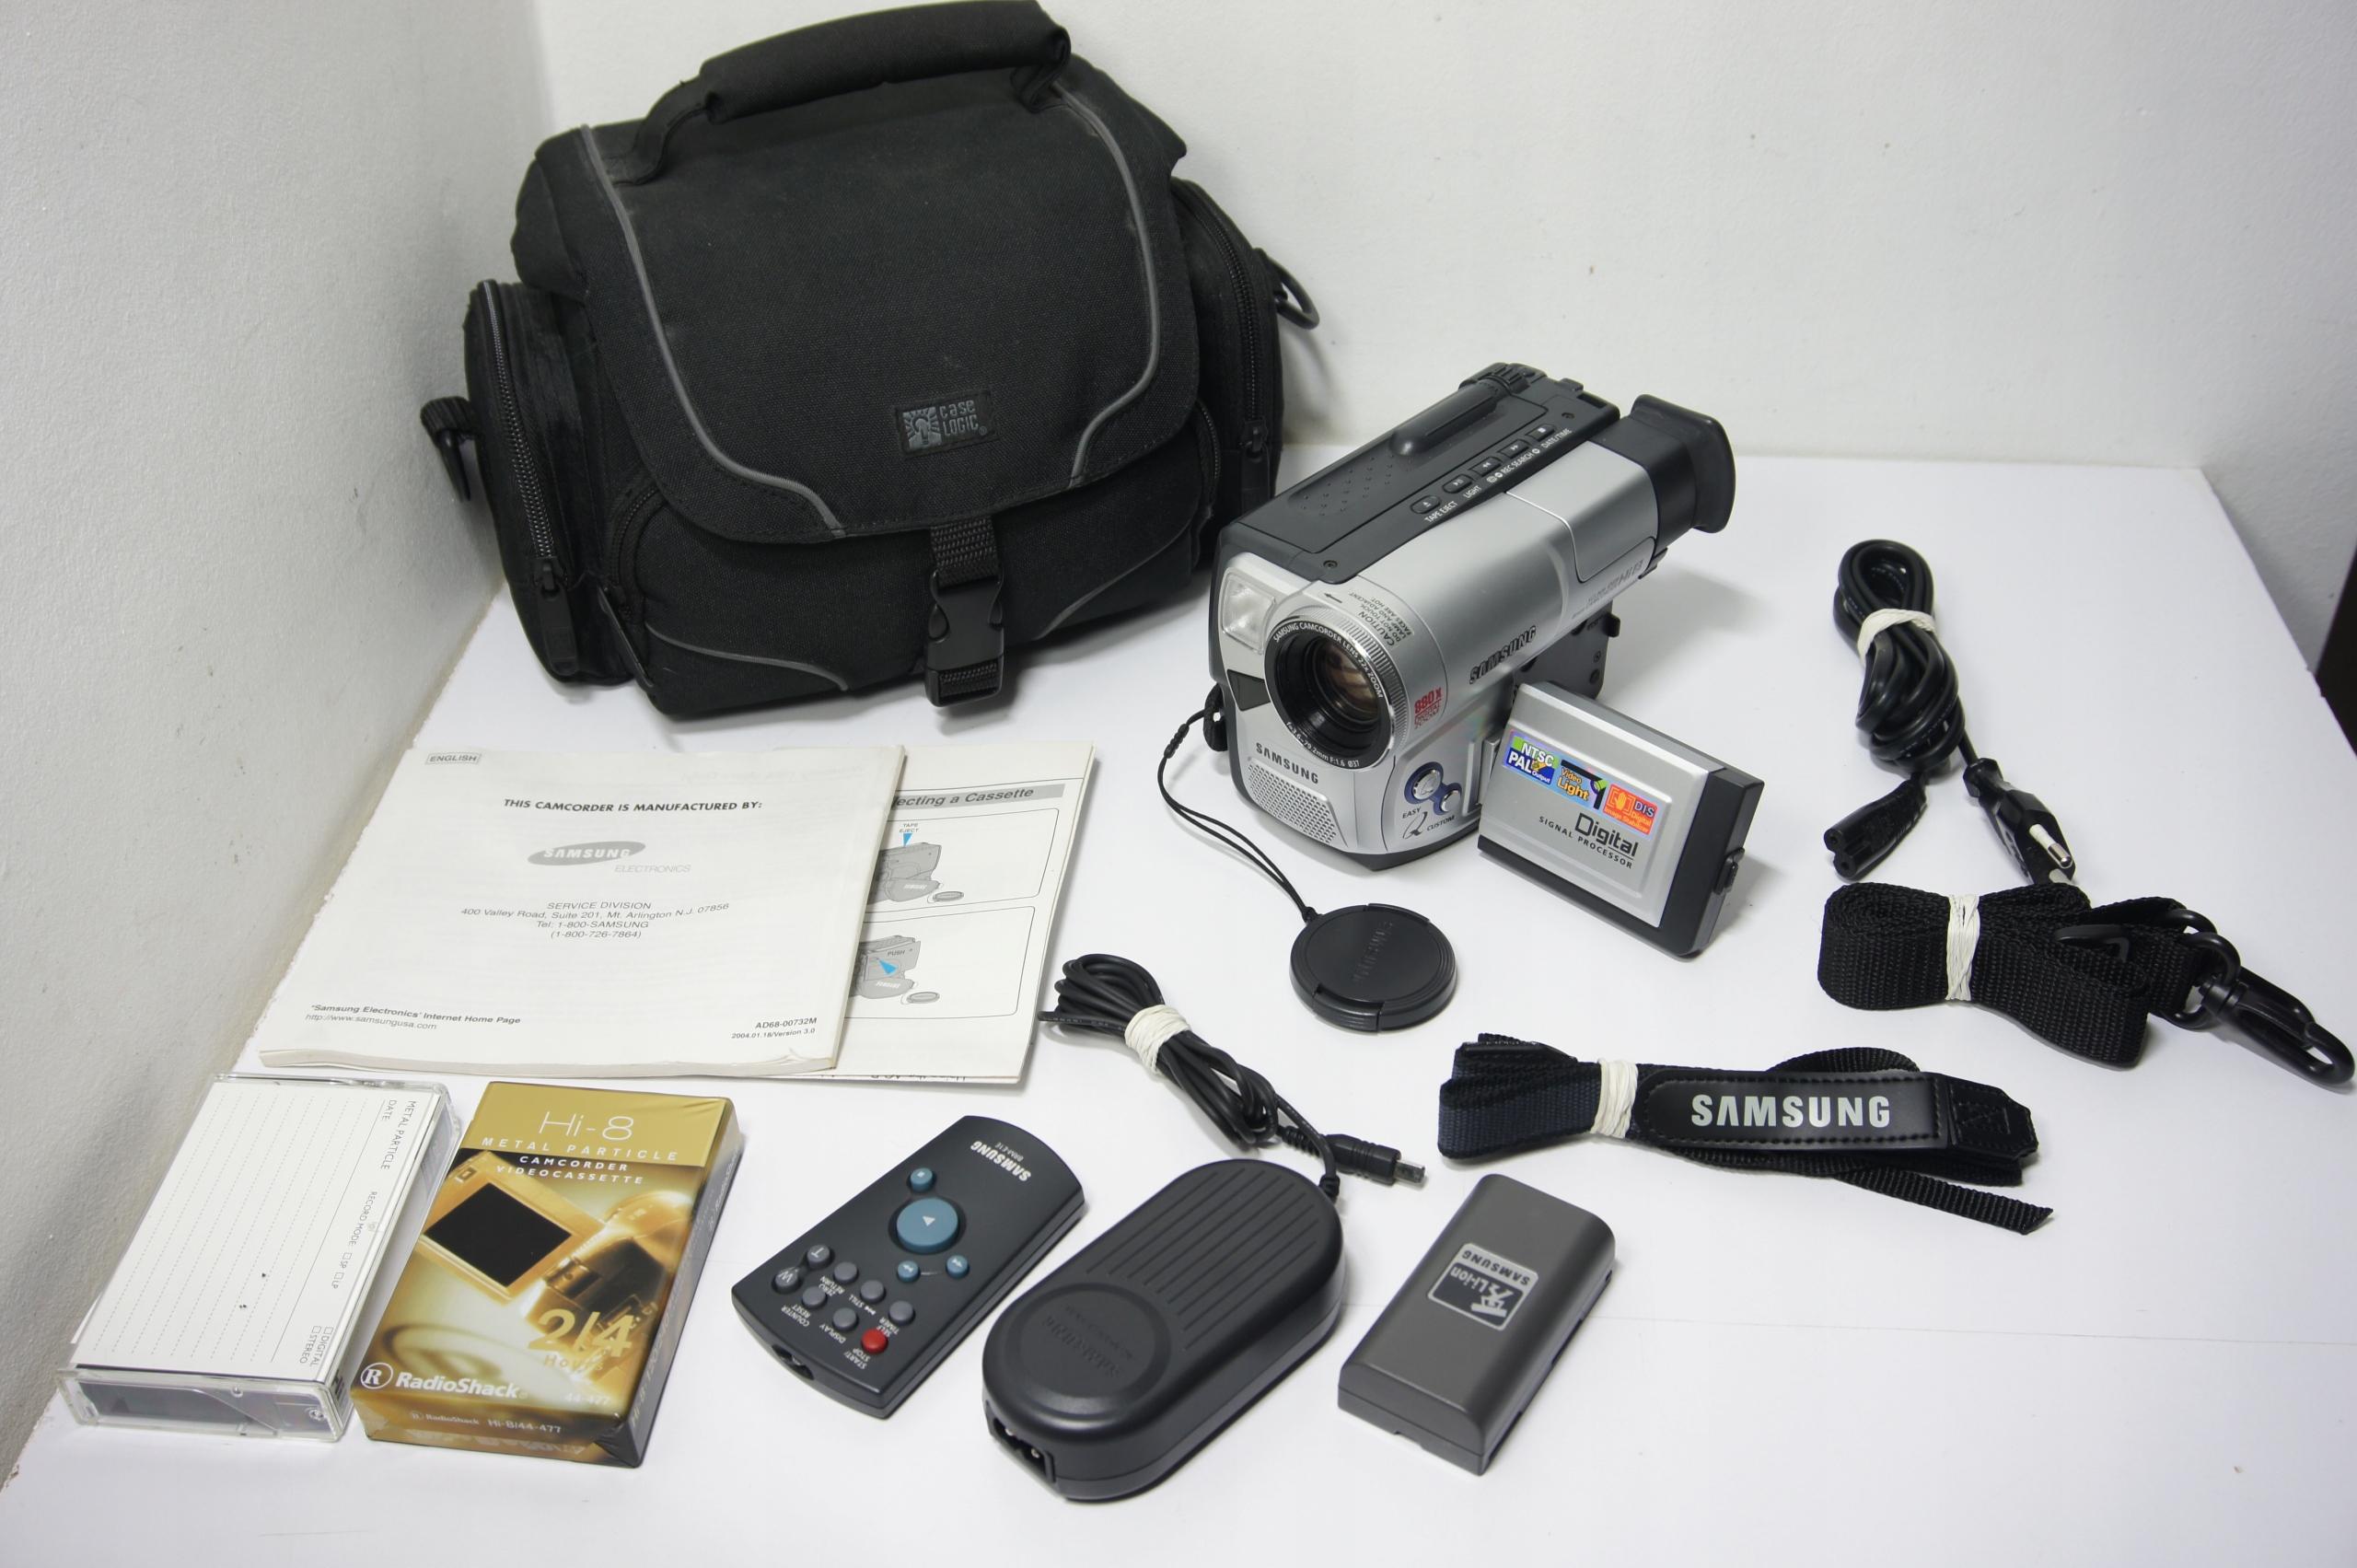 Kamera Analogowa Hi-8 Samsung SCL906 Hi-END LCD